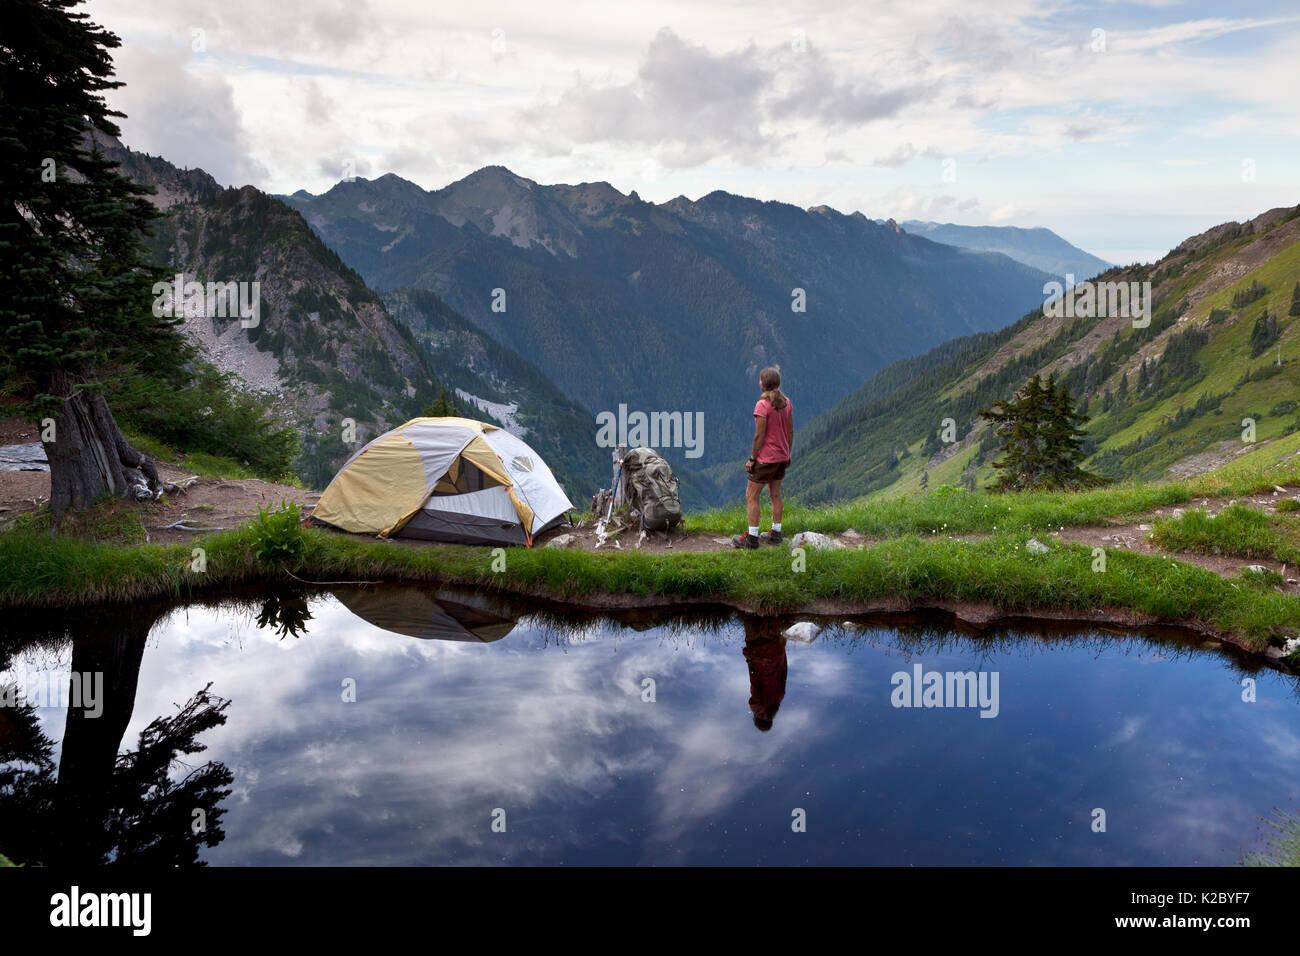 Camping reflétée dans l'eau à Boston Charlie's Camp, Bailey, Traverse, Olympic National Park, Washington, USA, août 2014. Photo Stock